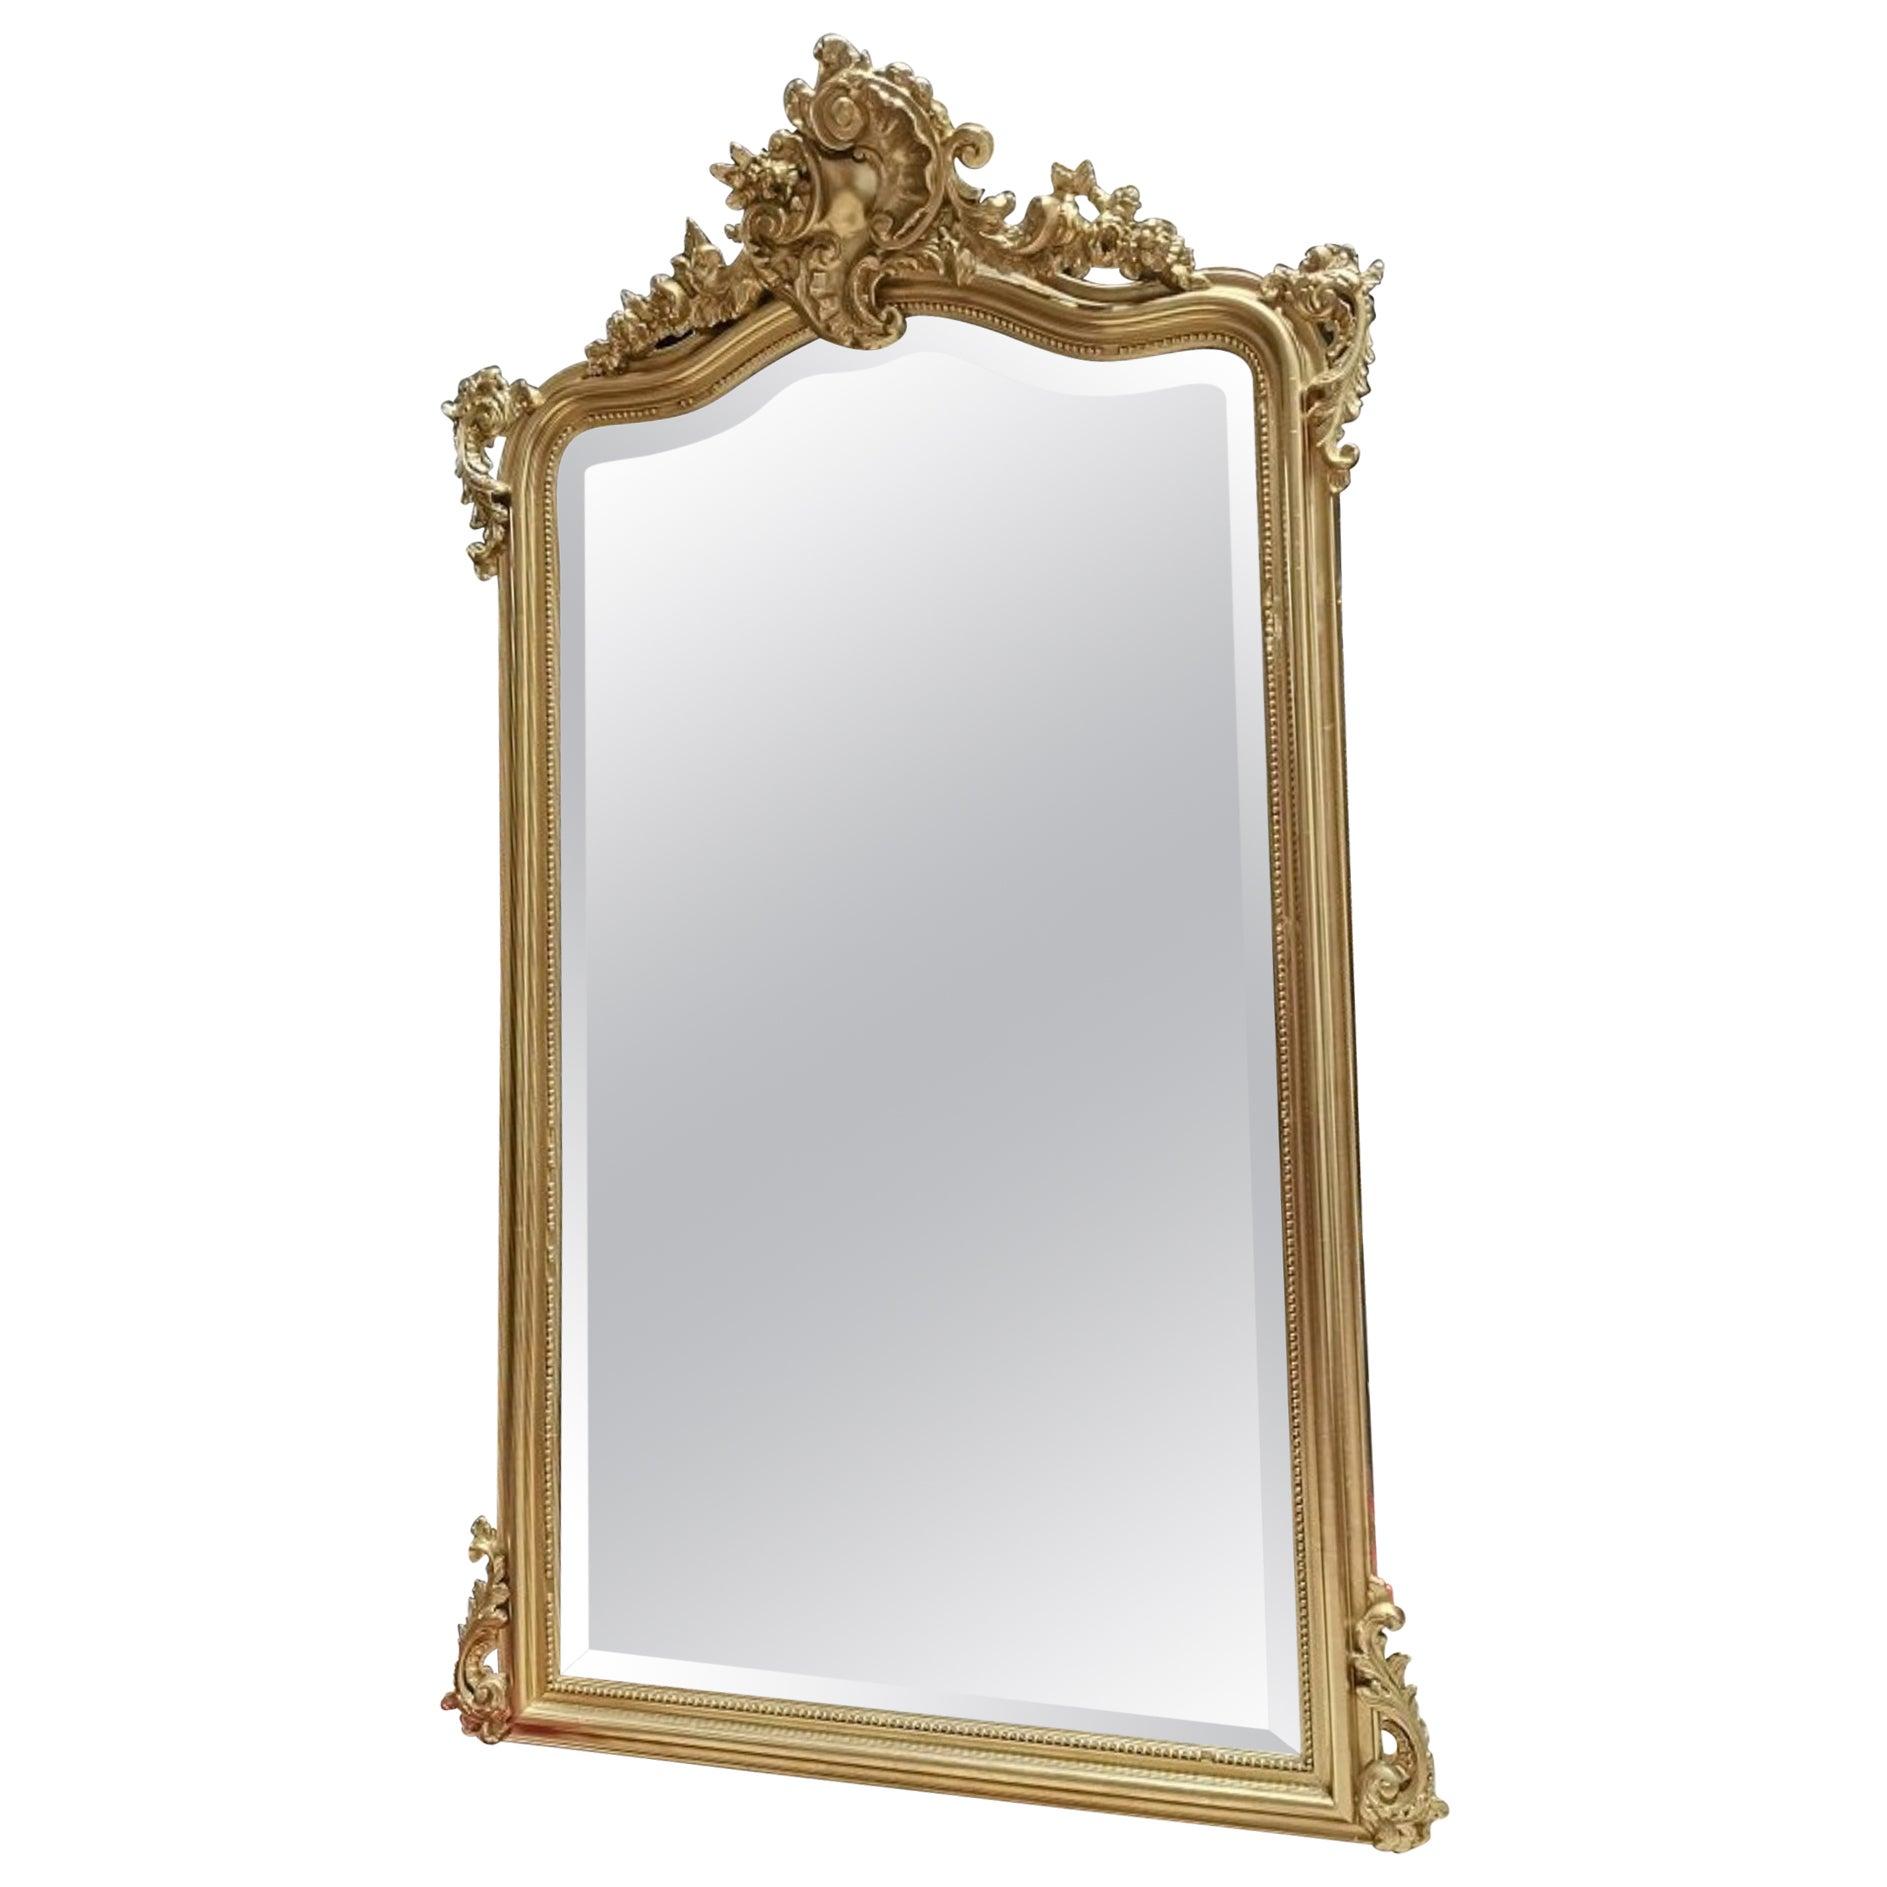 Napoleon III Large French Wall Mirror, 19th Century